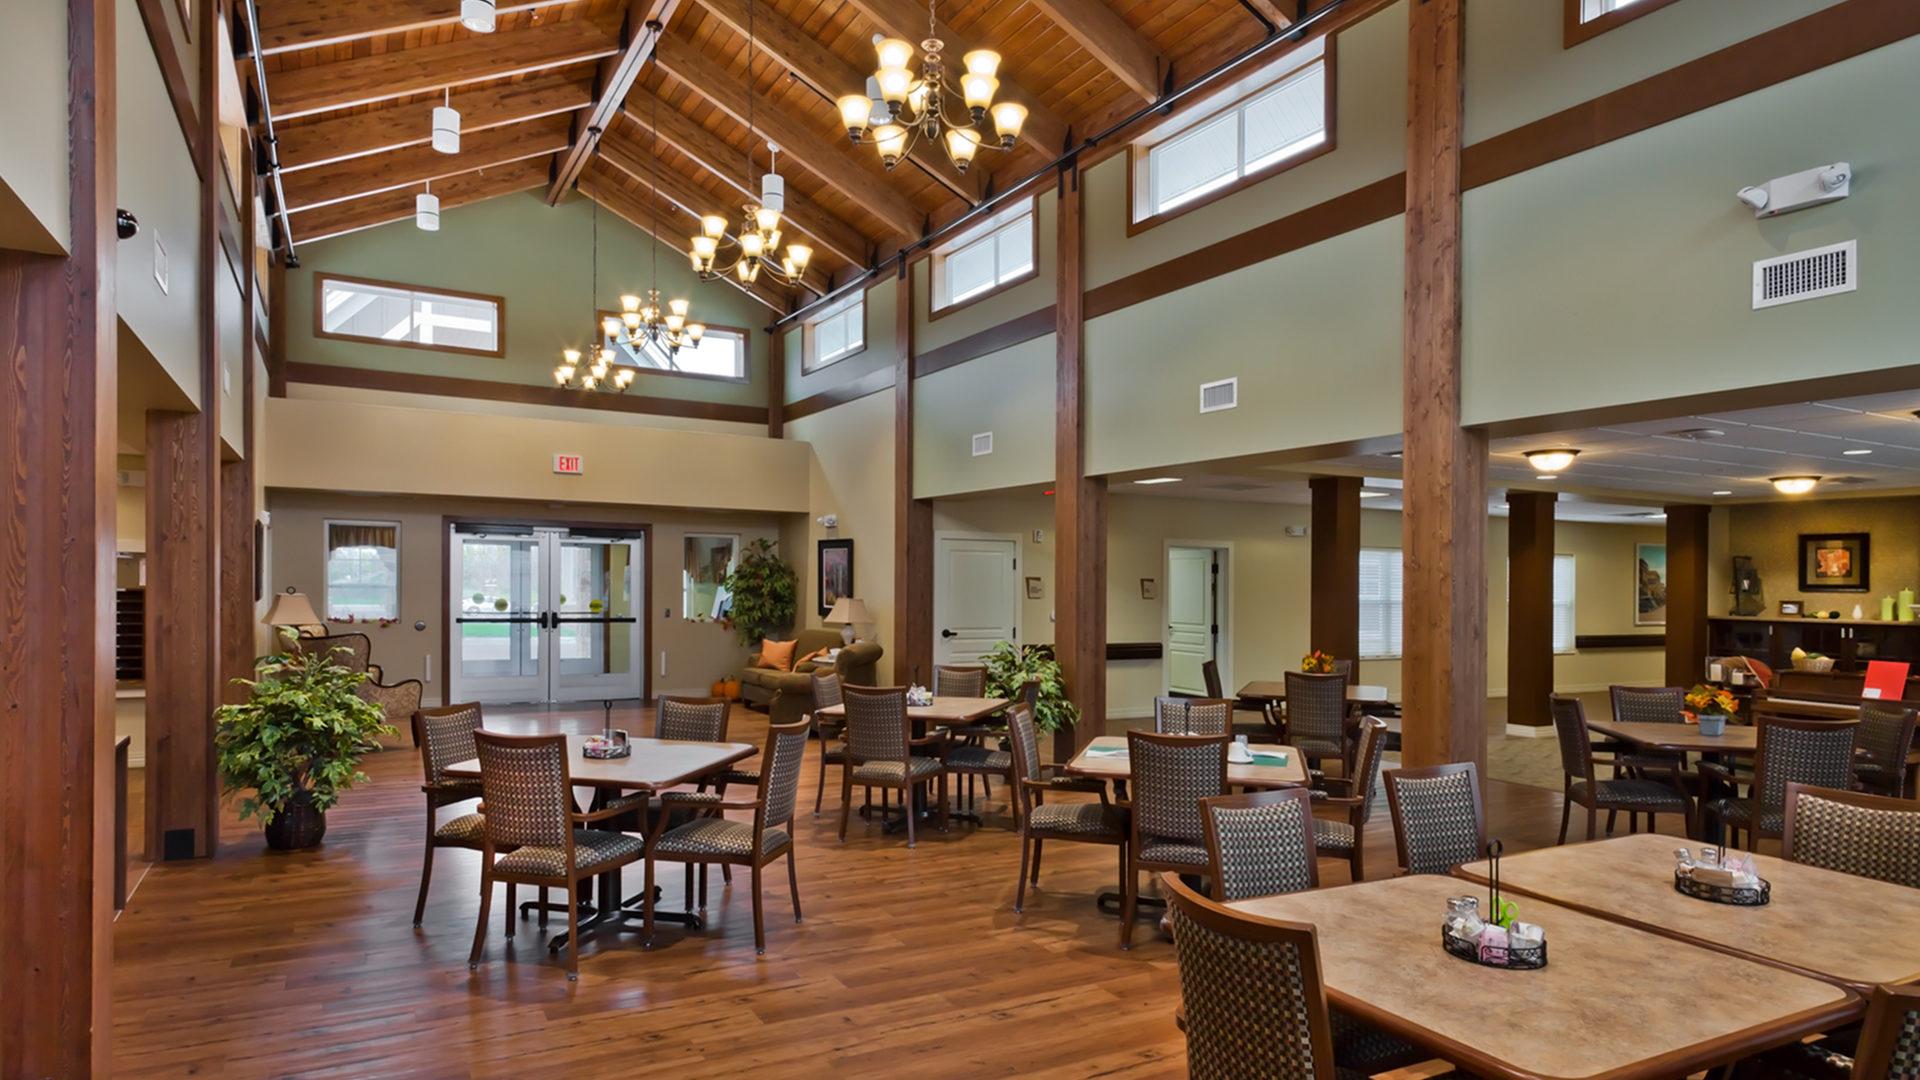 Good Samaritan Society International Falls Interior Dining Room with Vaulted Beamed Ceiling